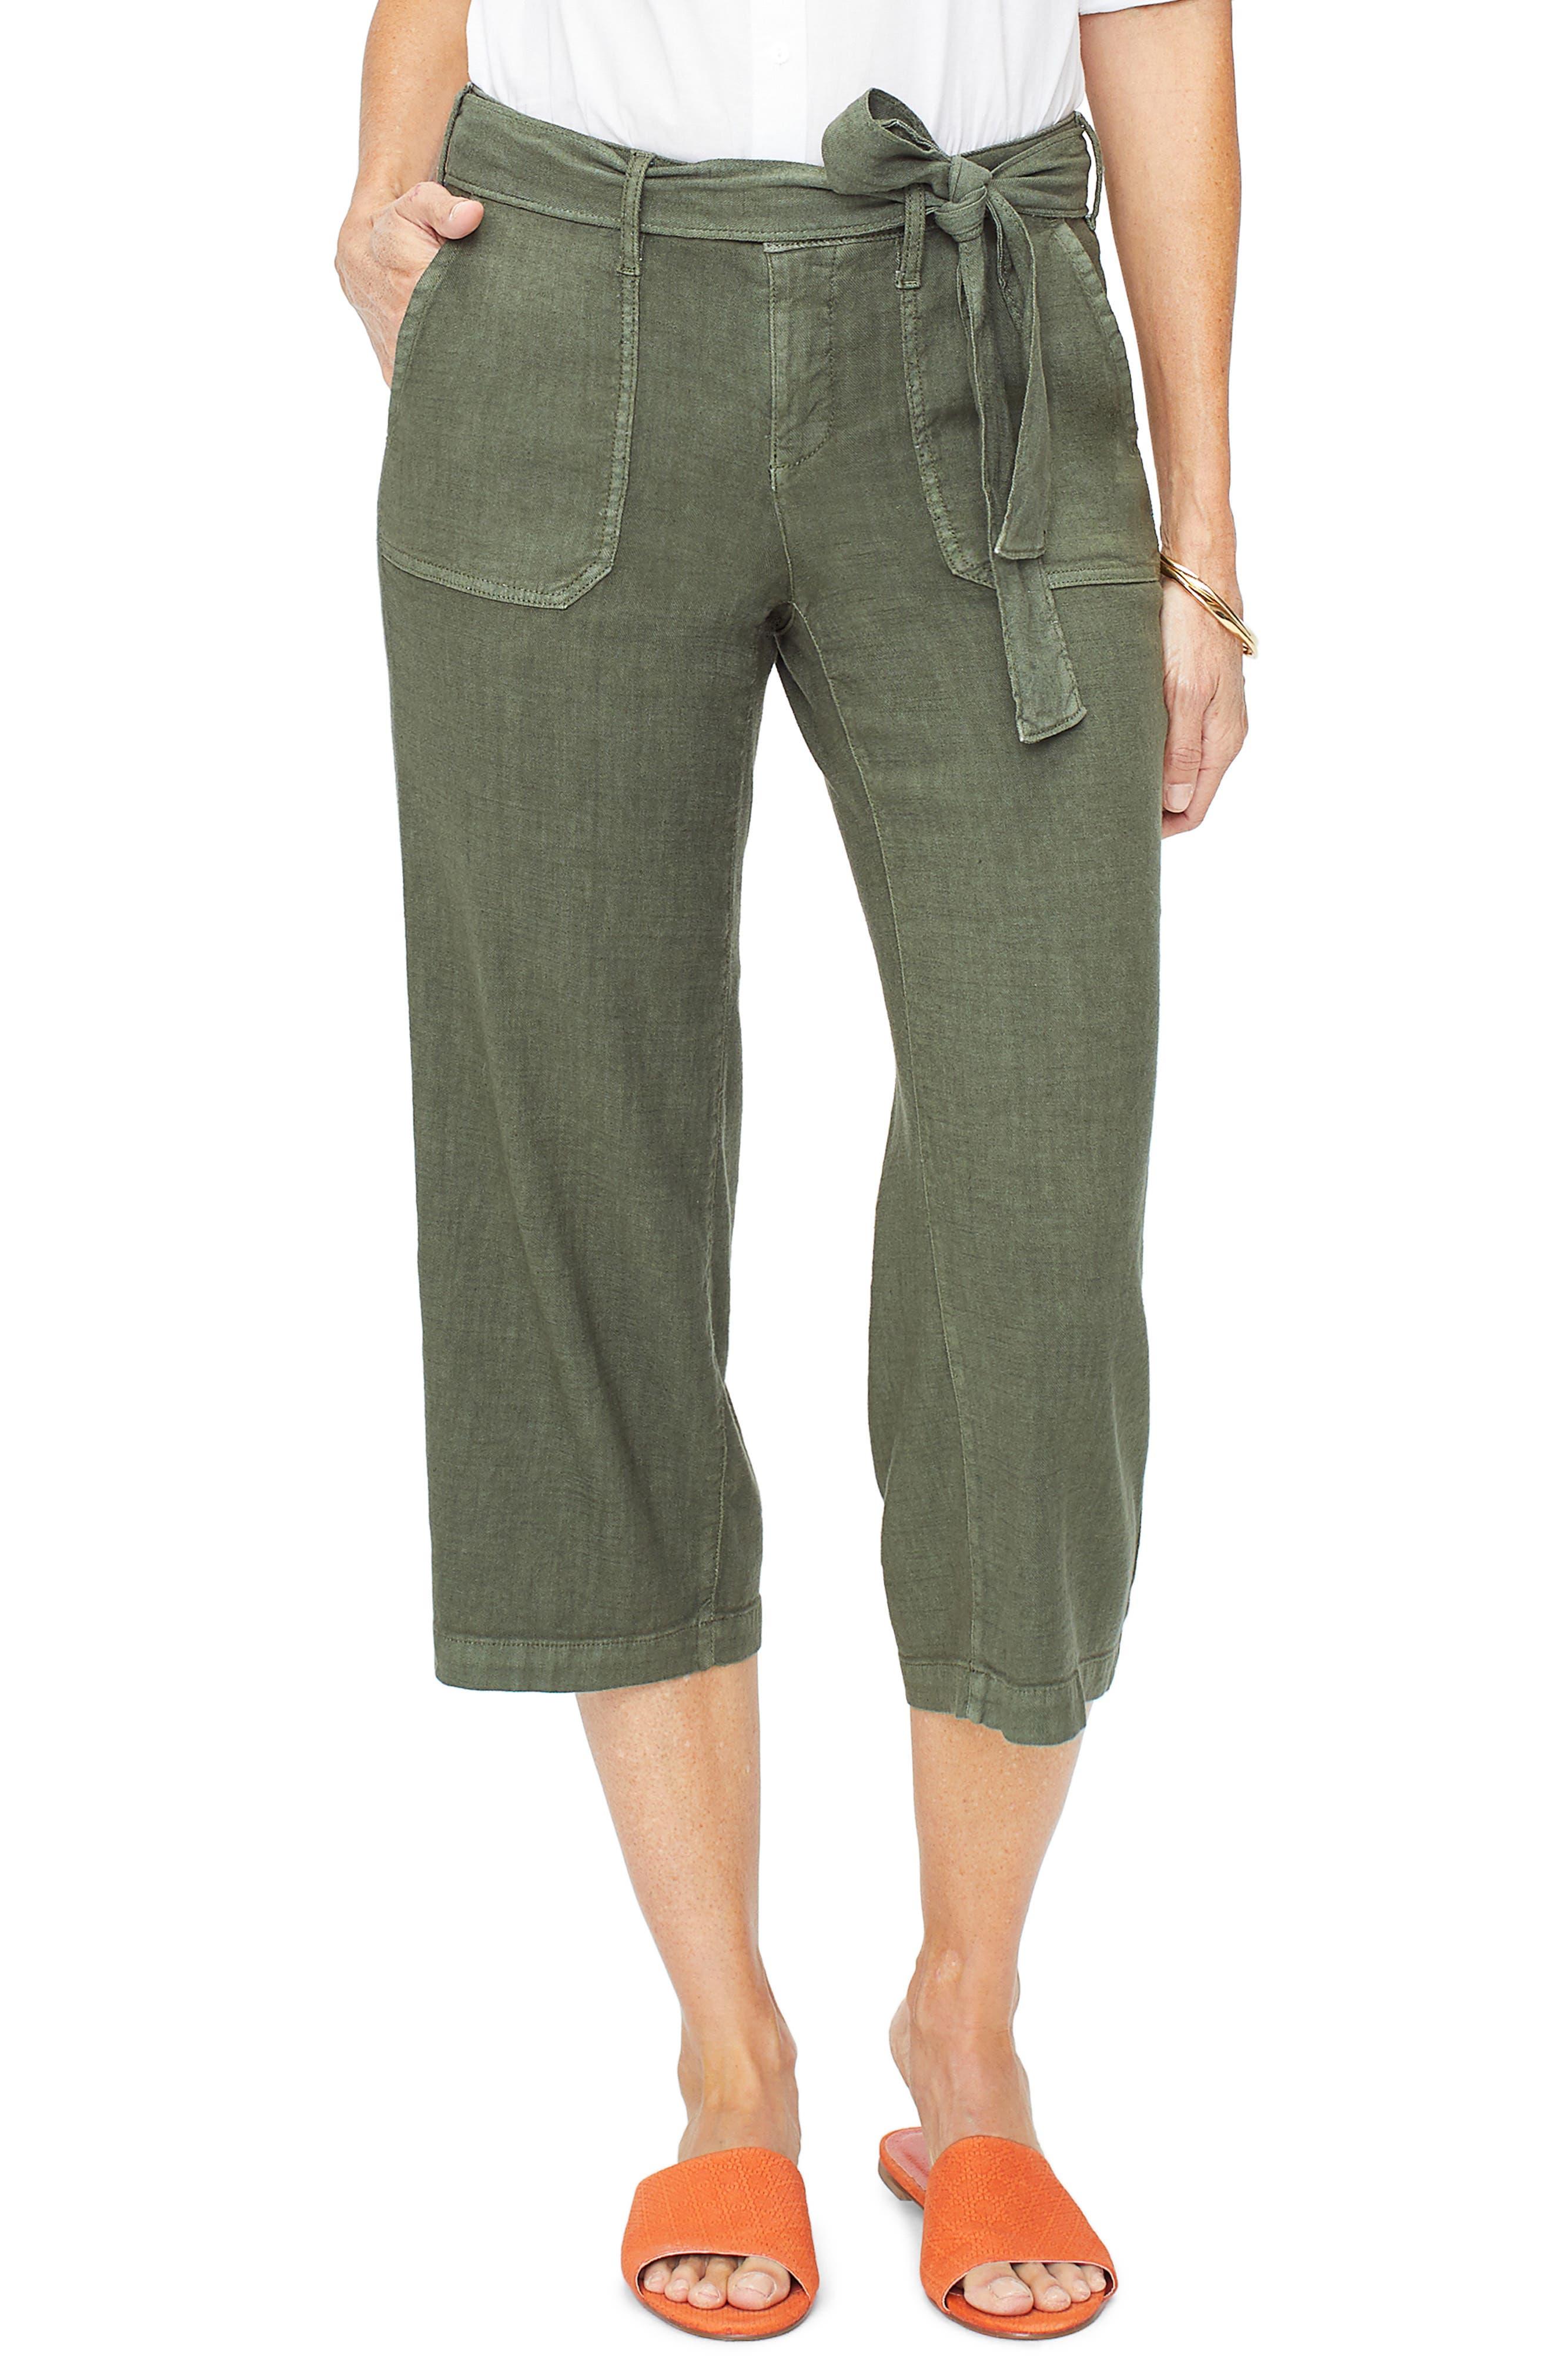 Nydj Fashion Cargo Capri Pants, Green